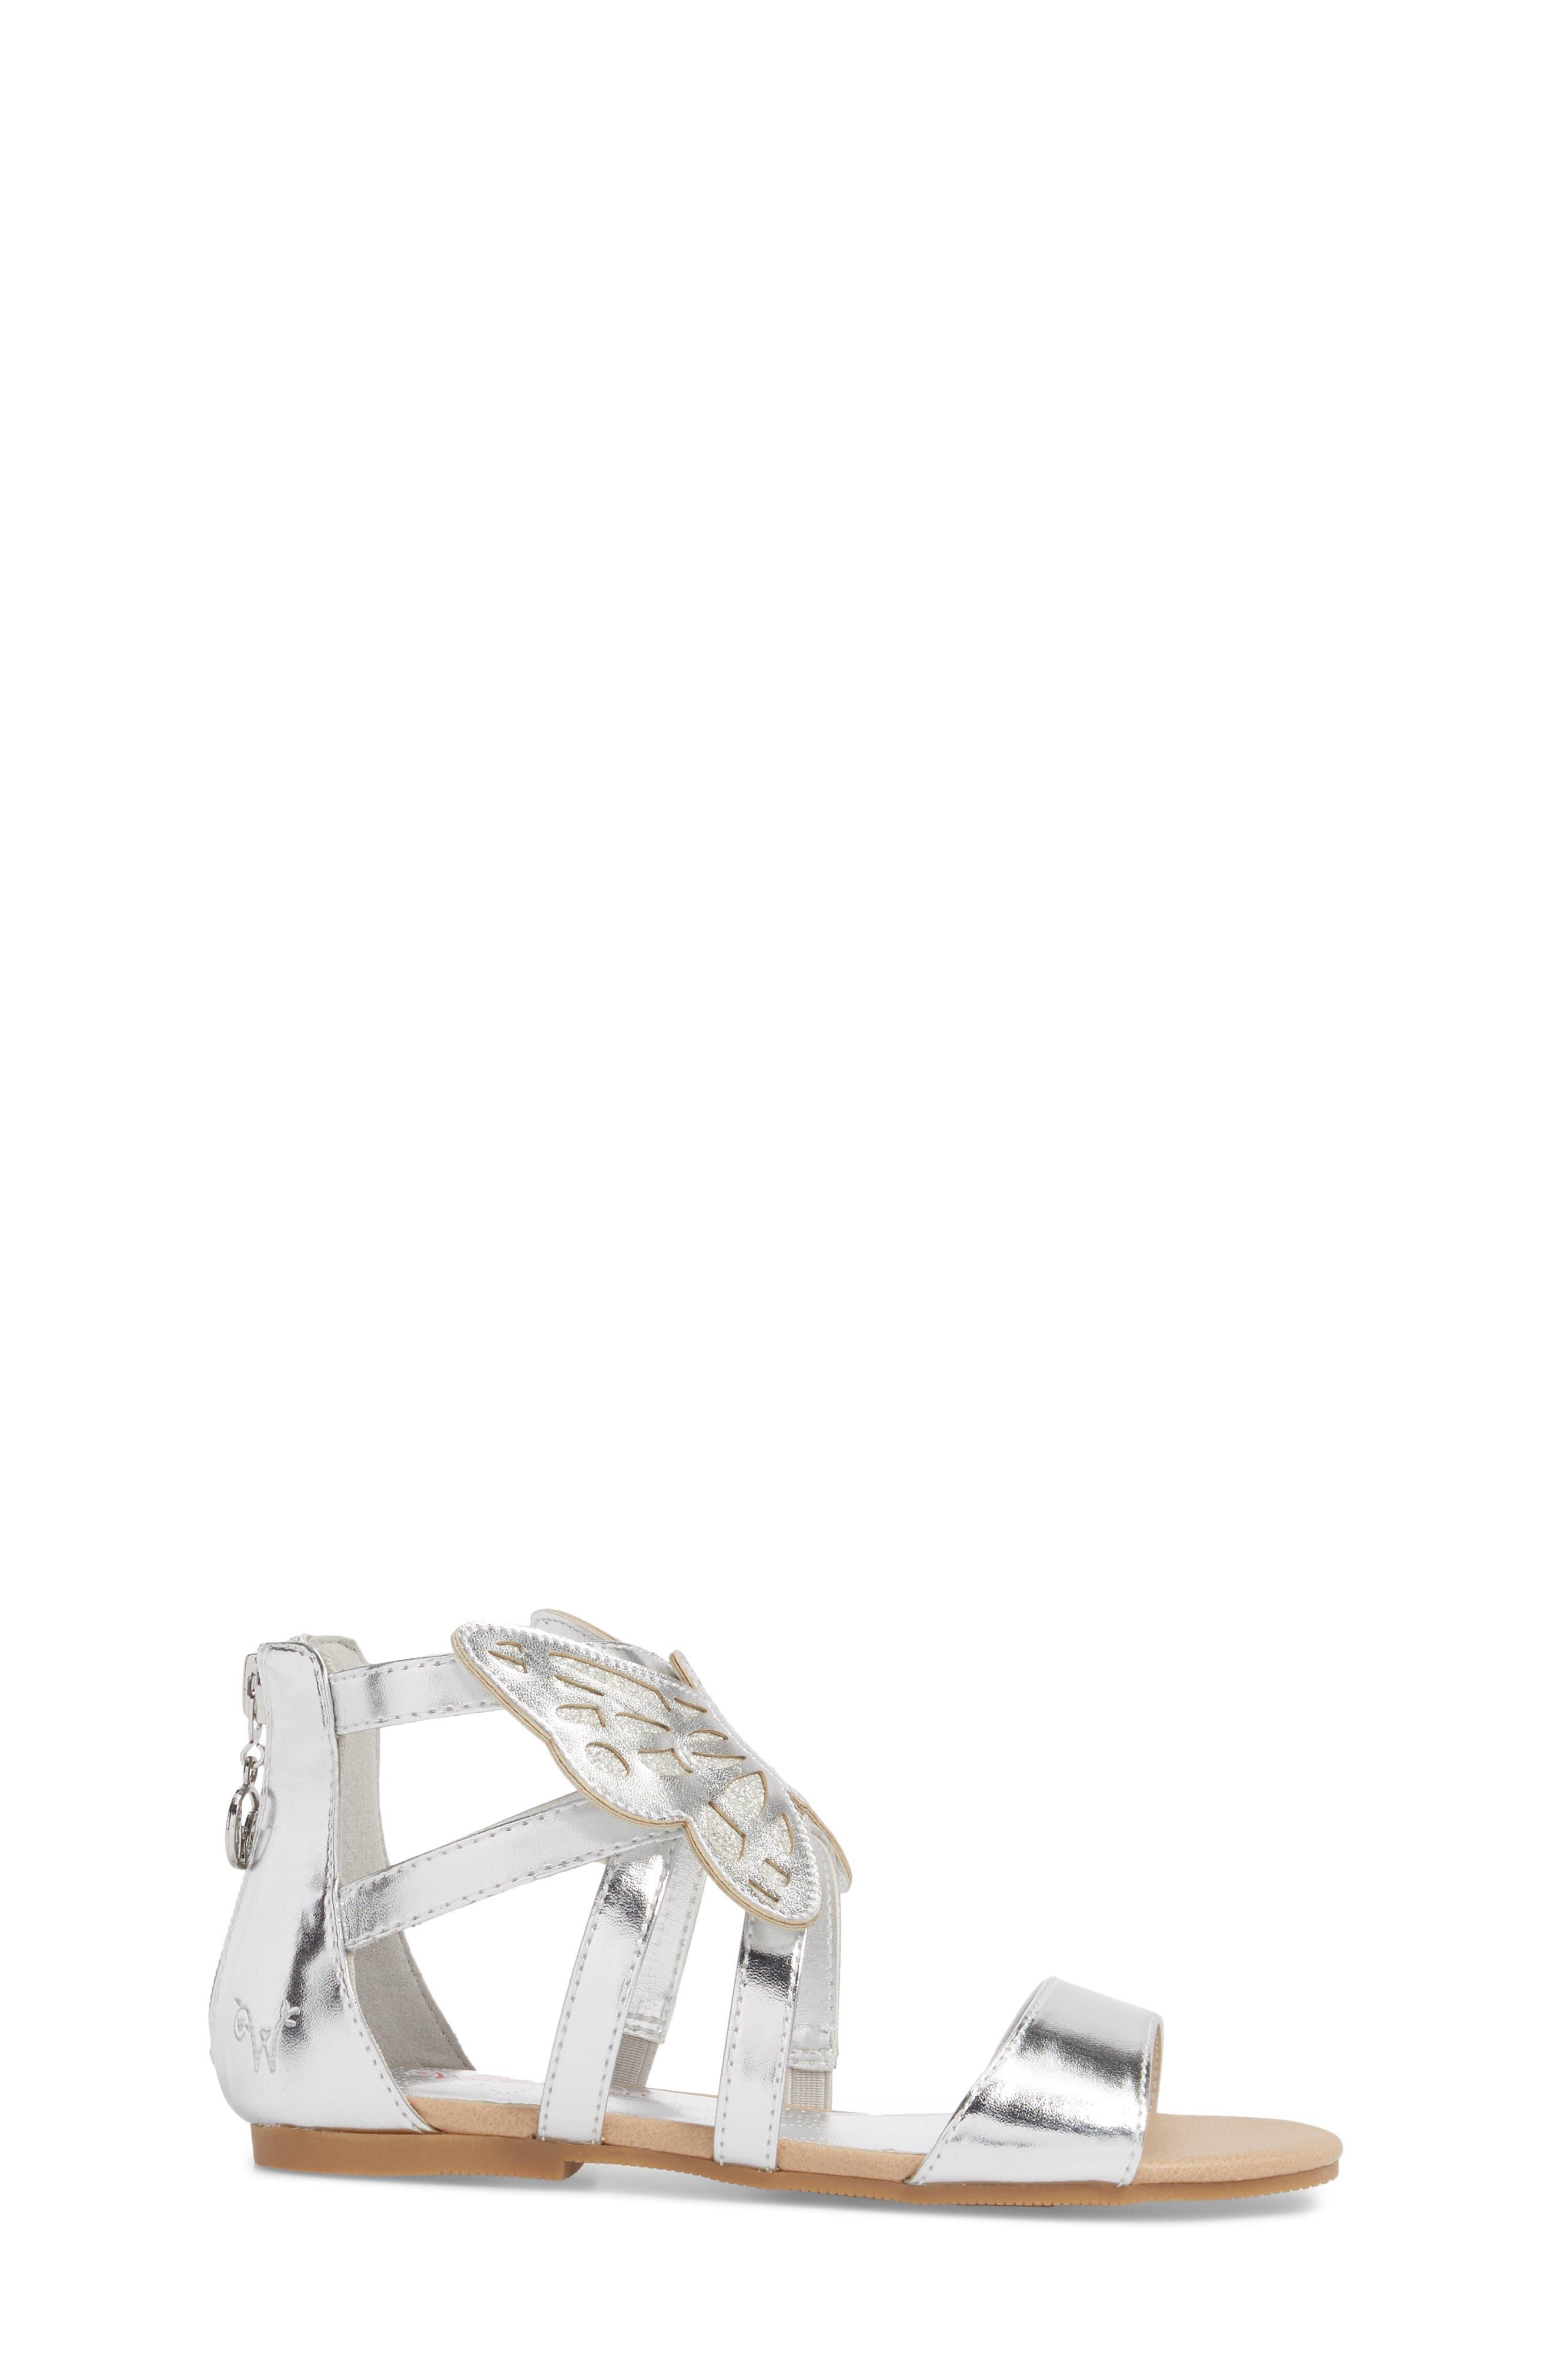 Willa Flutter Metallic Sandal,                             Alternate thumbnail 3, color,                             Silver Metallic